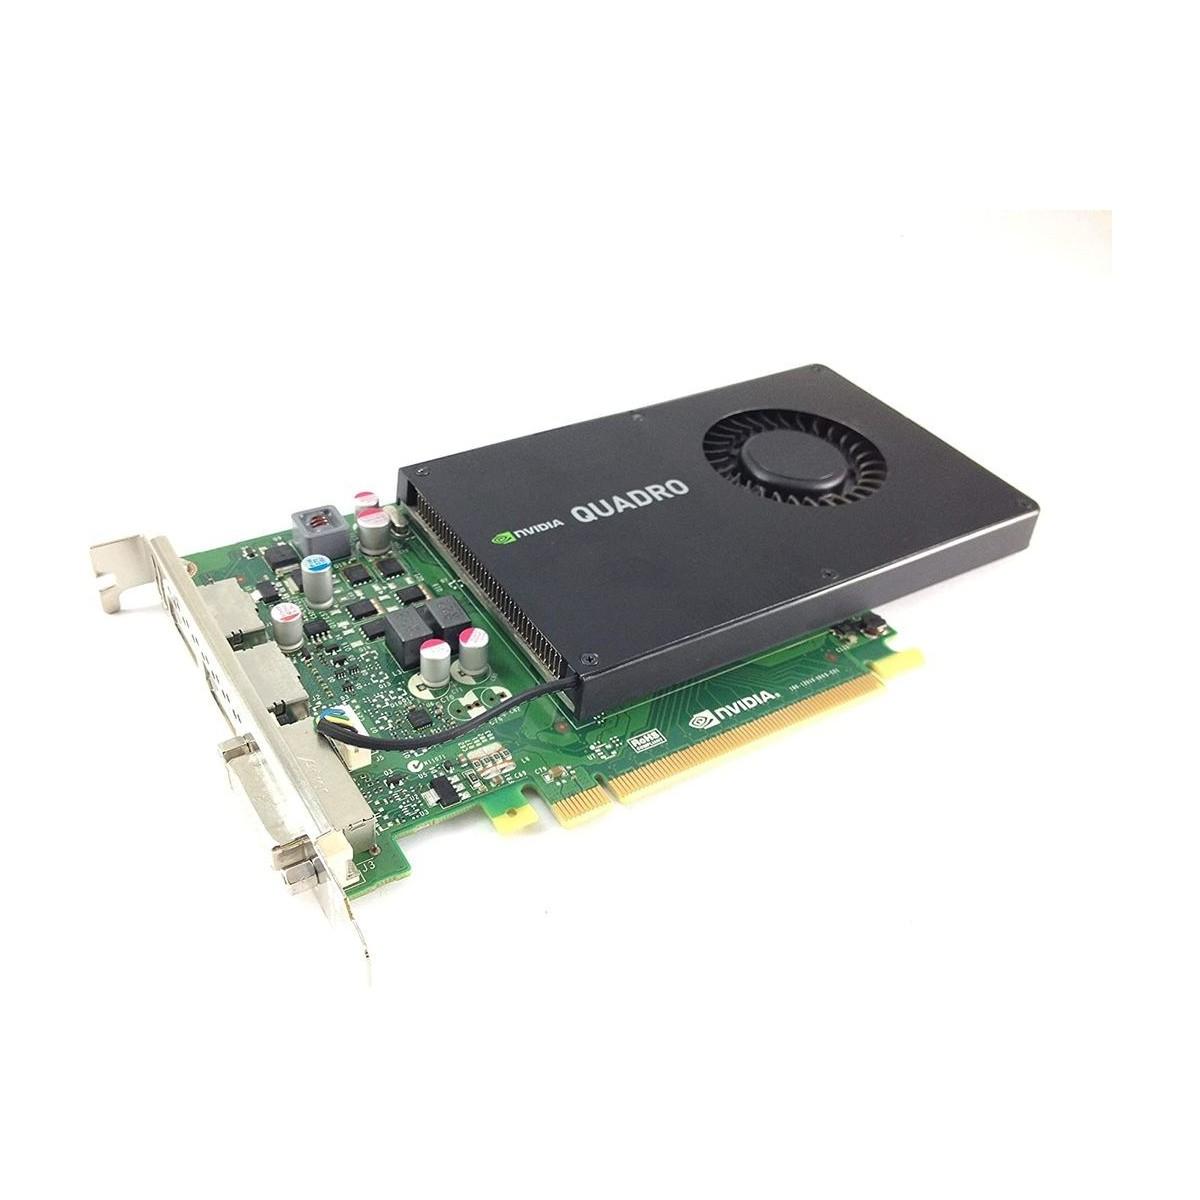 IBM x3650 M3 2x2.40QC 16GB 2x300GB SAS M5015 2xPSU